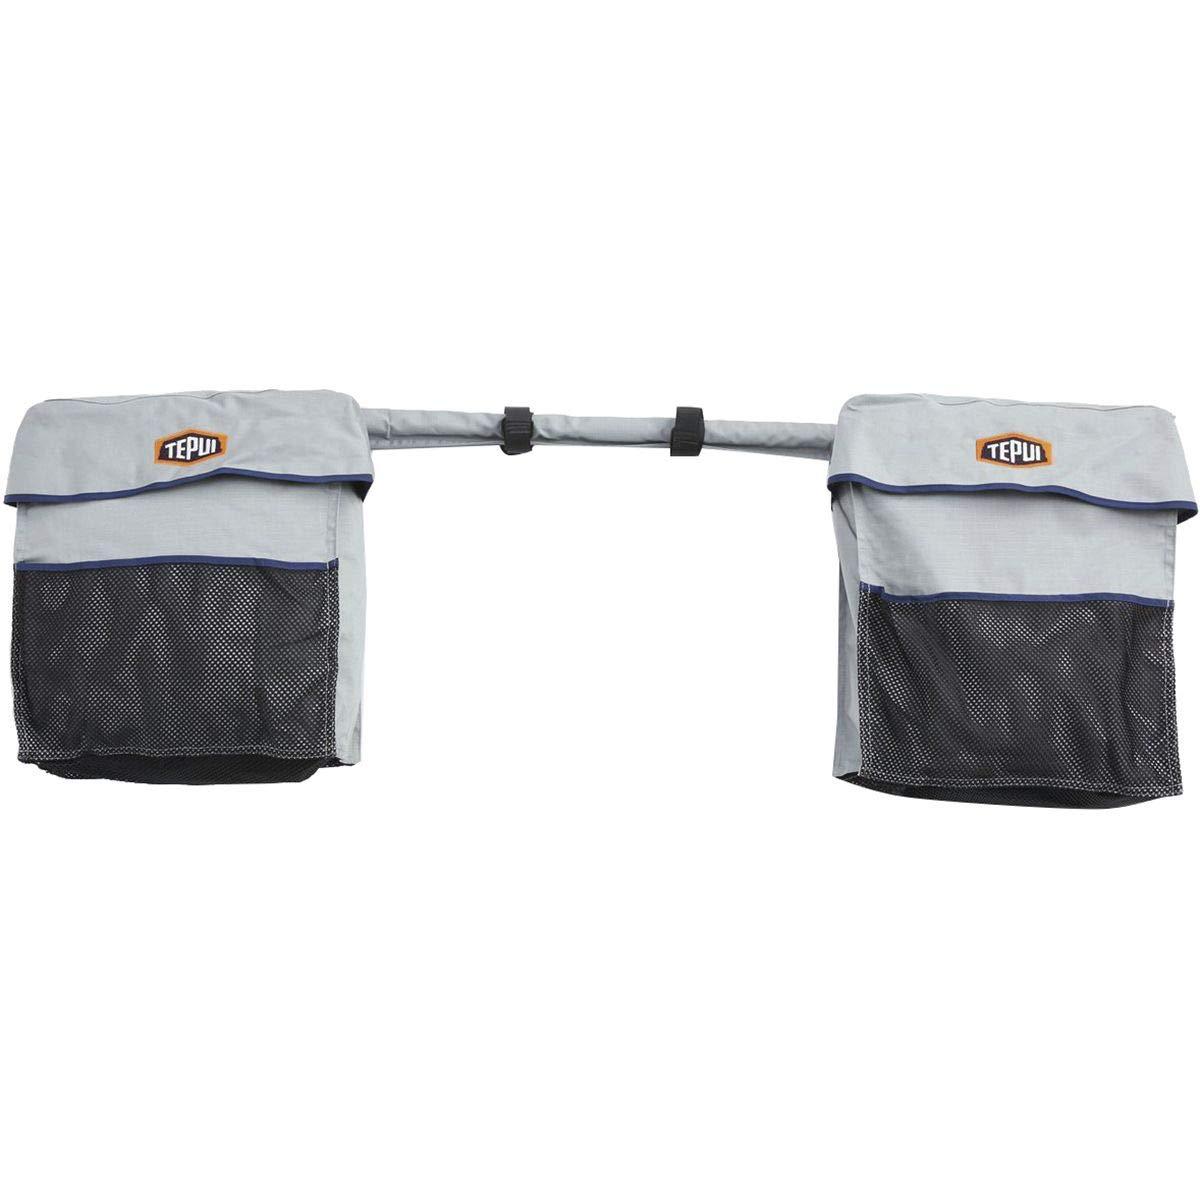 Tepui Double Boot Bag